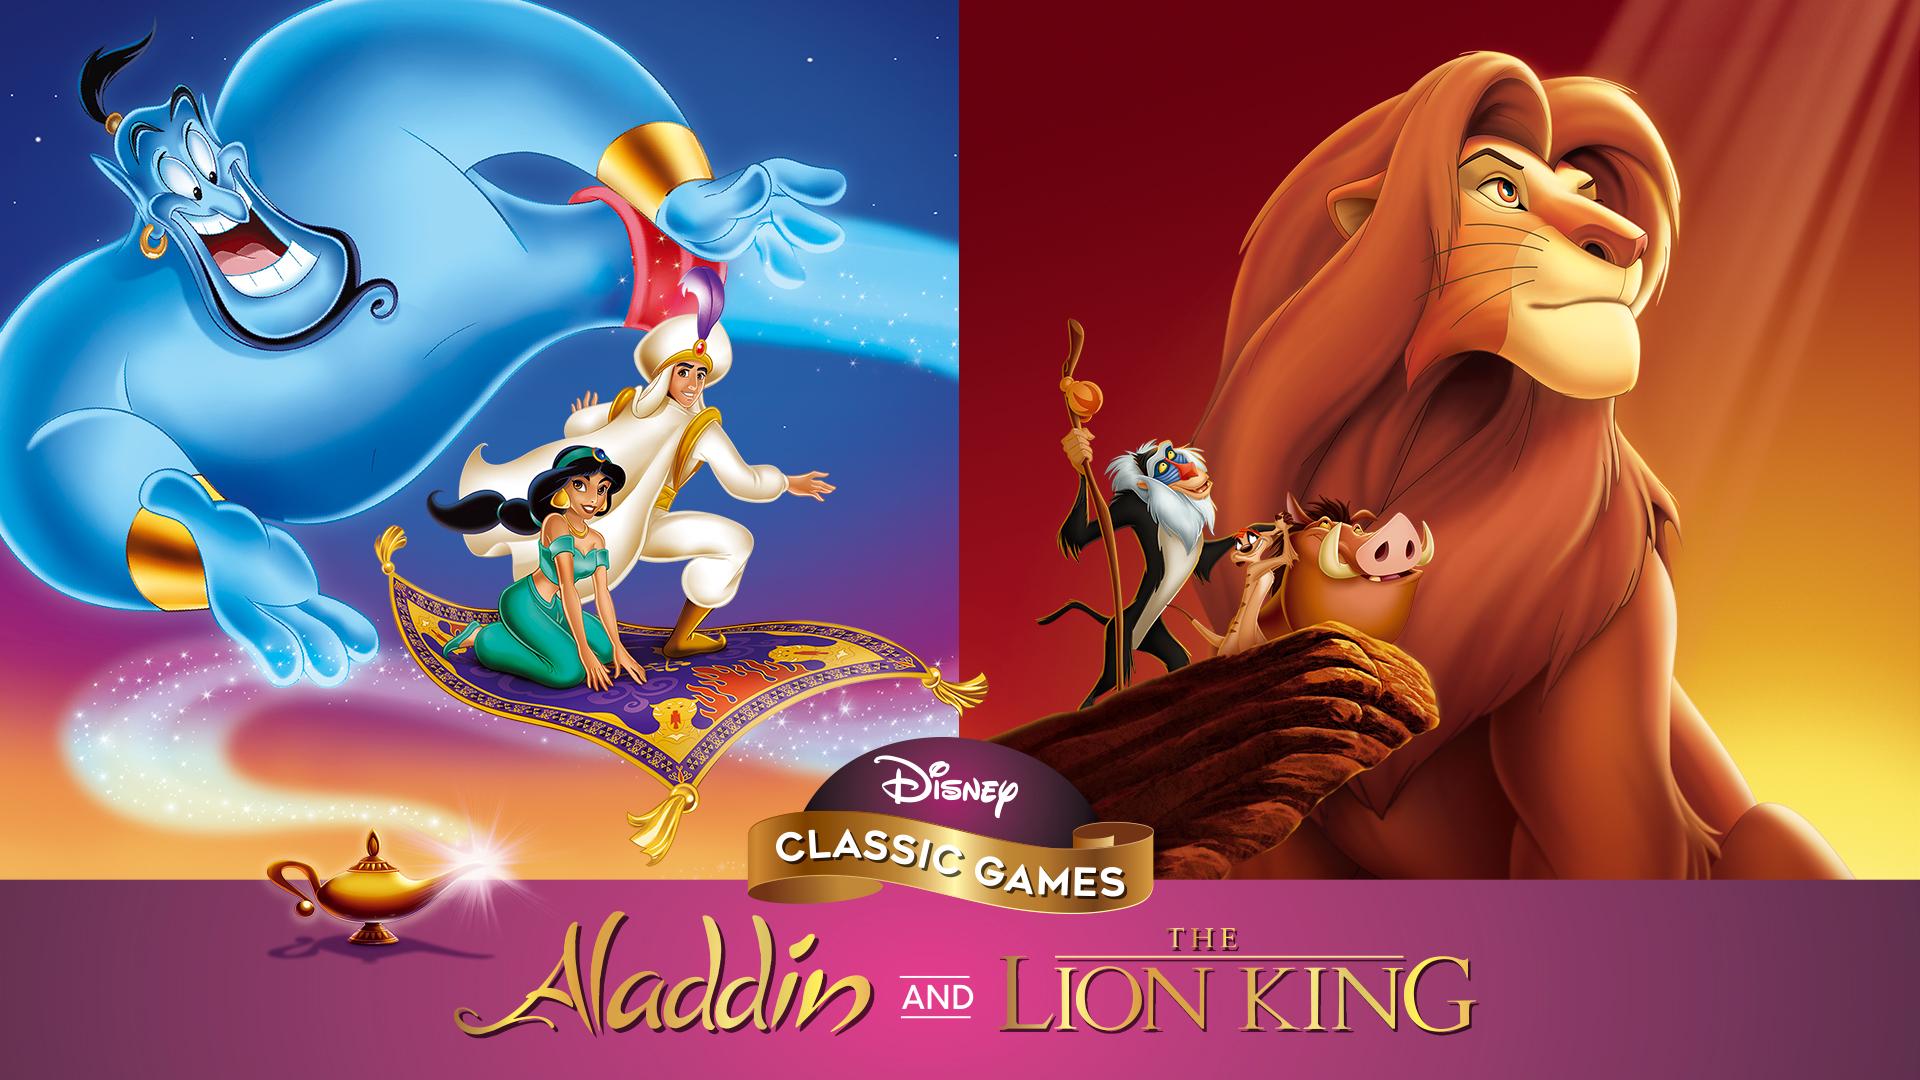 [Nintendo Switch] Disney Classic Games - Aladdin & The Lion King - £8.63 @ Nintendo eShop US